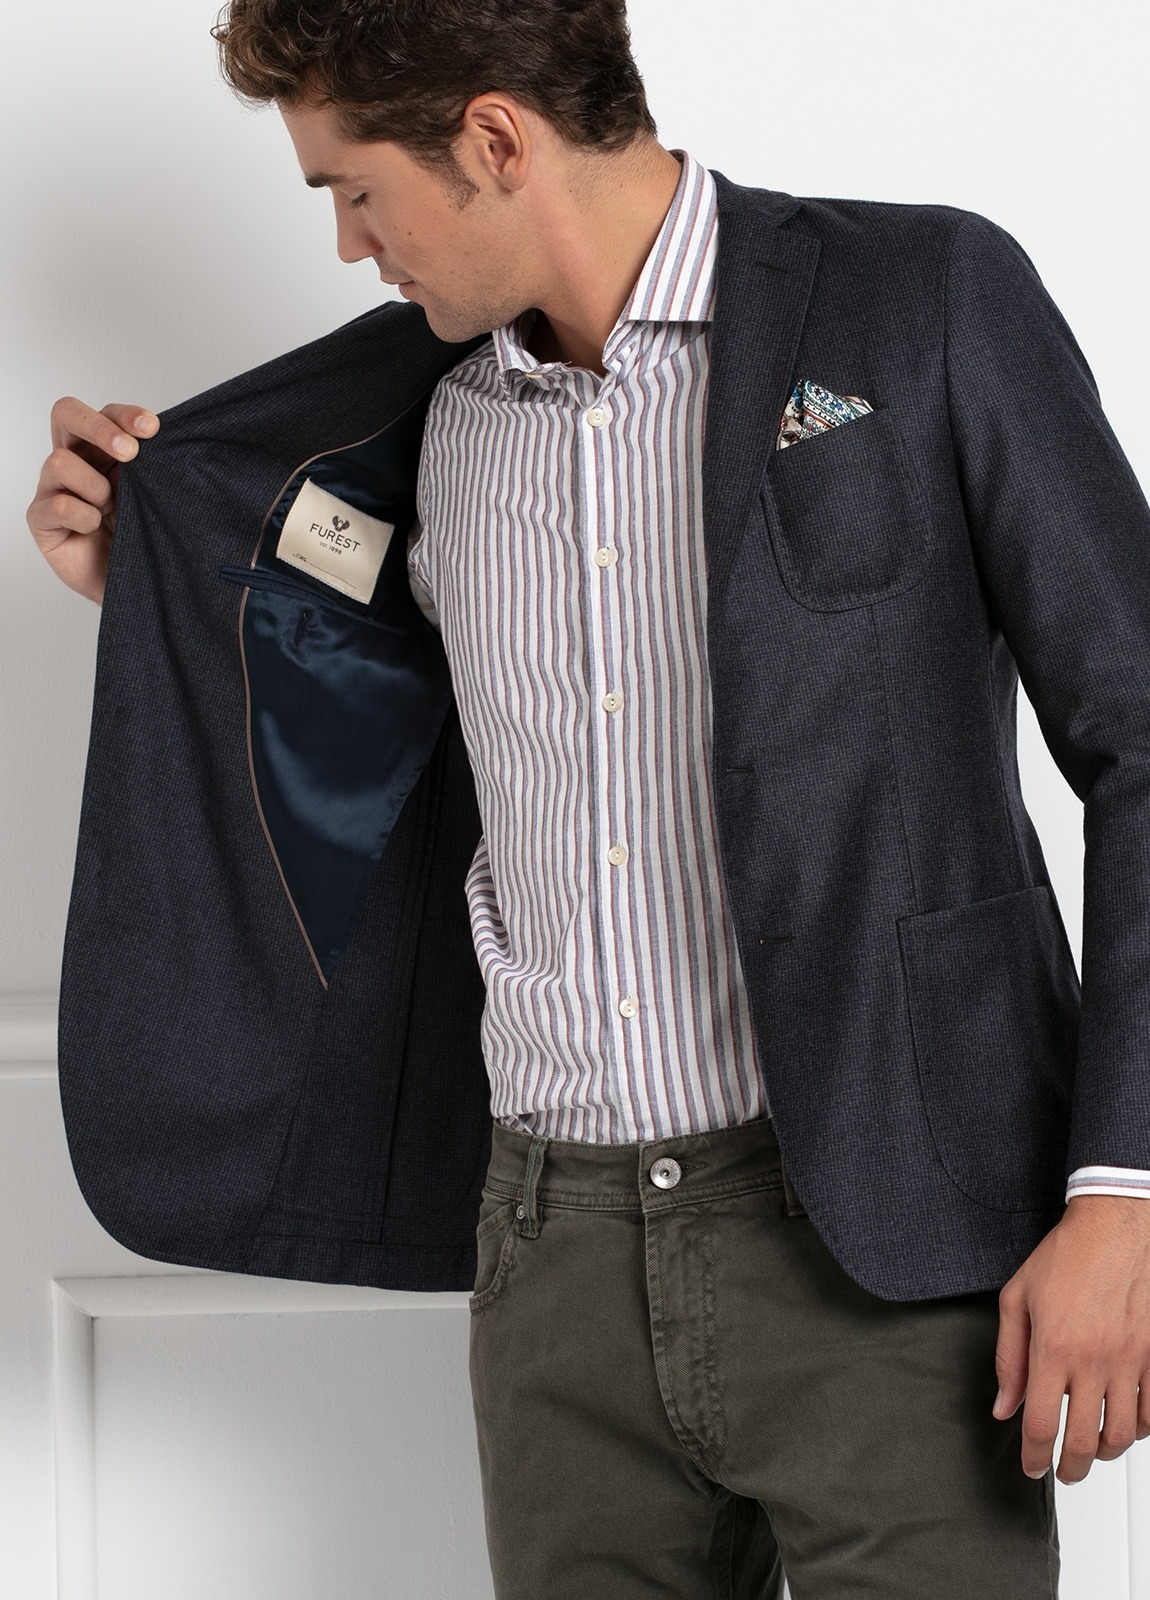 Americana SOFT JACKET Slim Fit, diseño tipo Cheviot cuadro vichy color gris. 100% Lana. - Ítem2